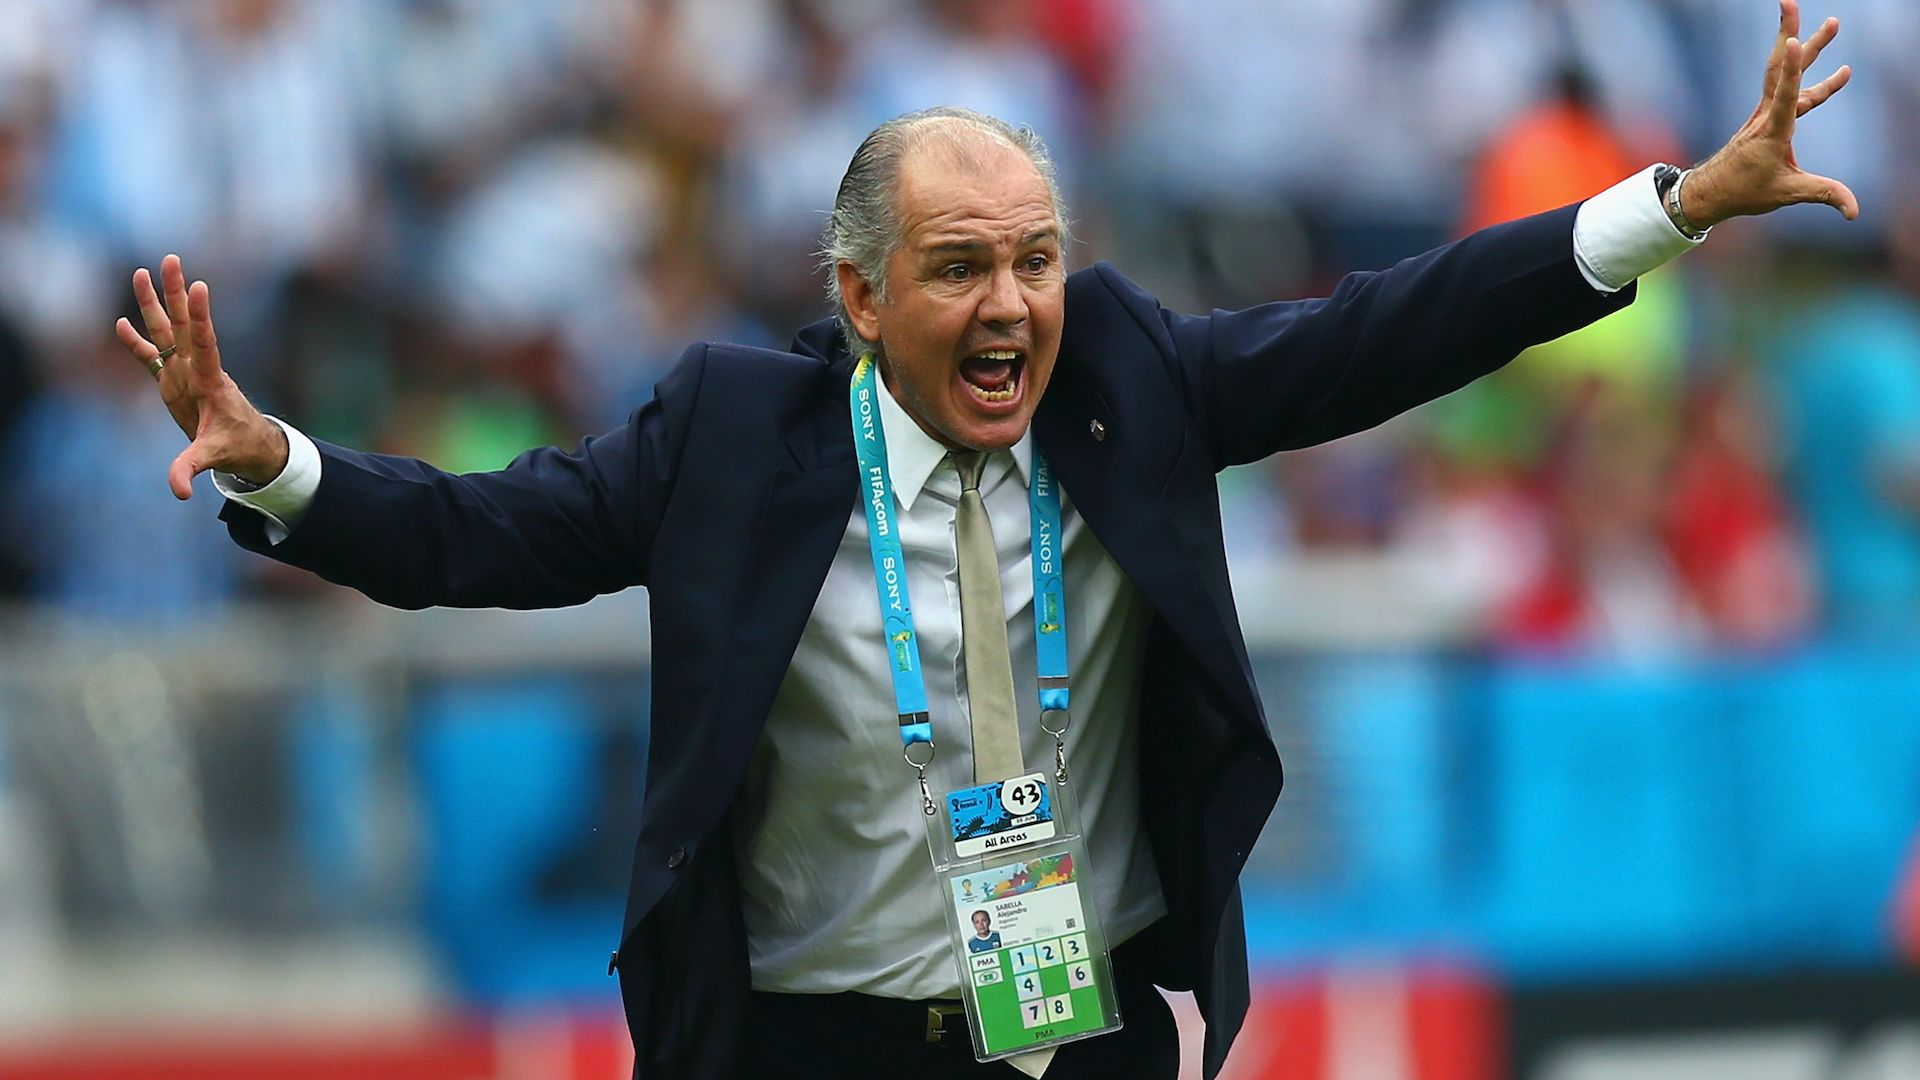 Почина треньорът, извел Аржентина до финала на Мондиал 2014